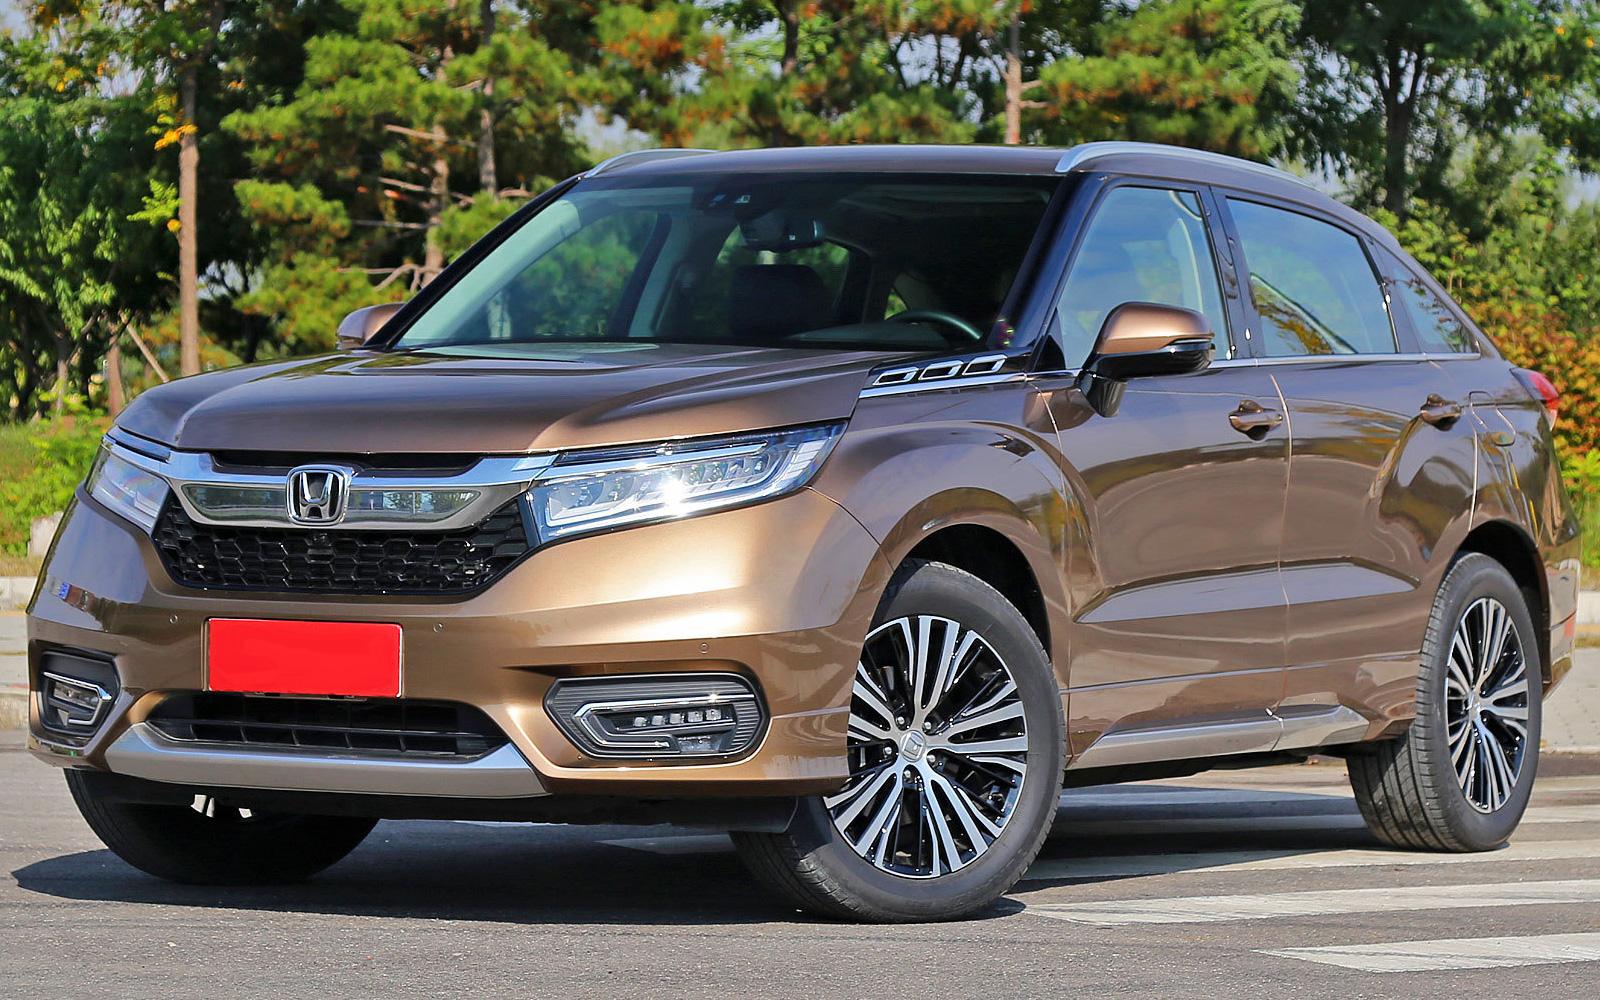 Honda Avancier (2018-2019) цена и характеристики ...